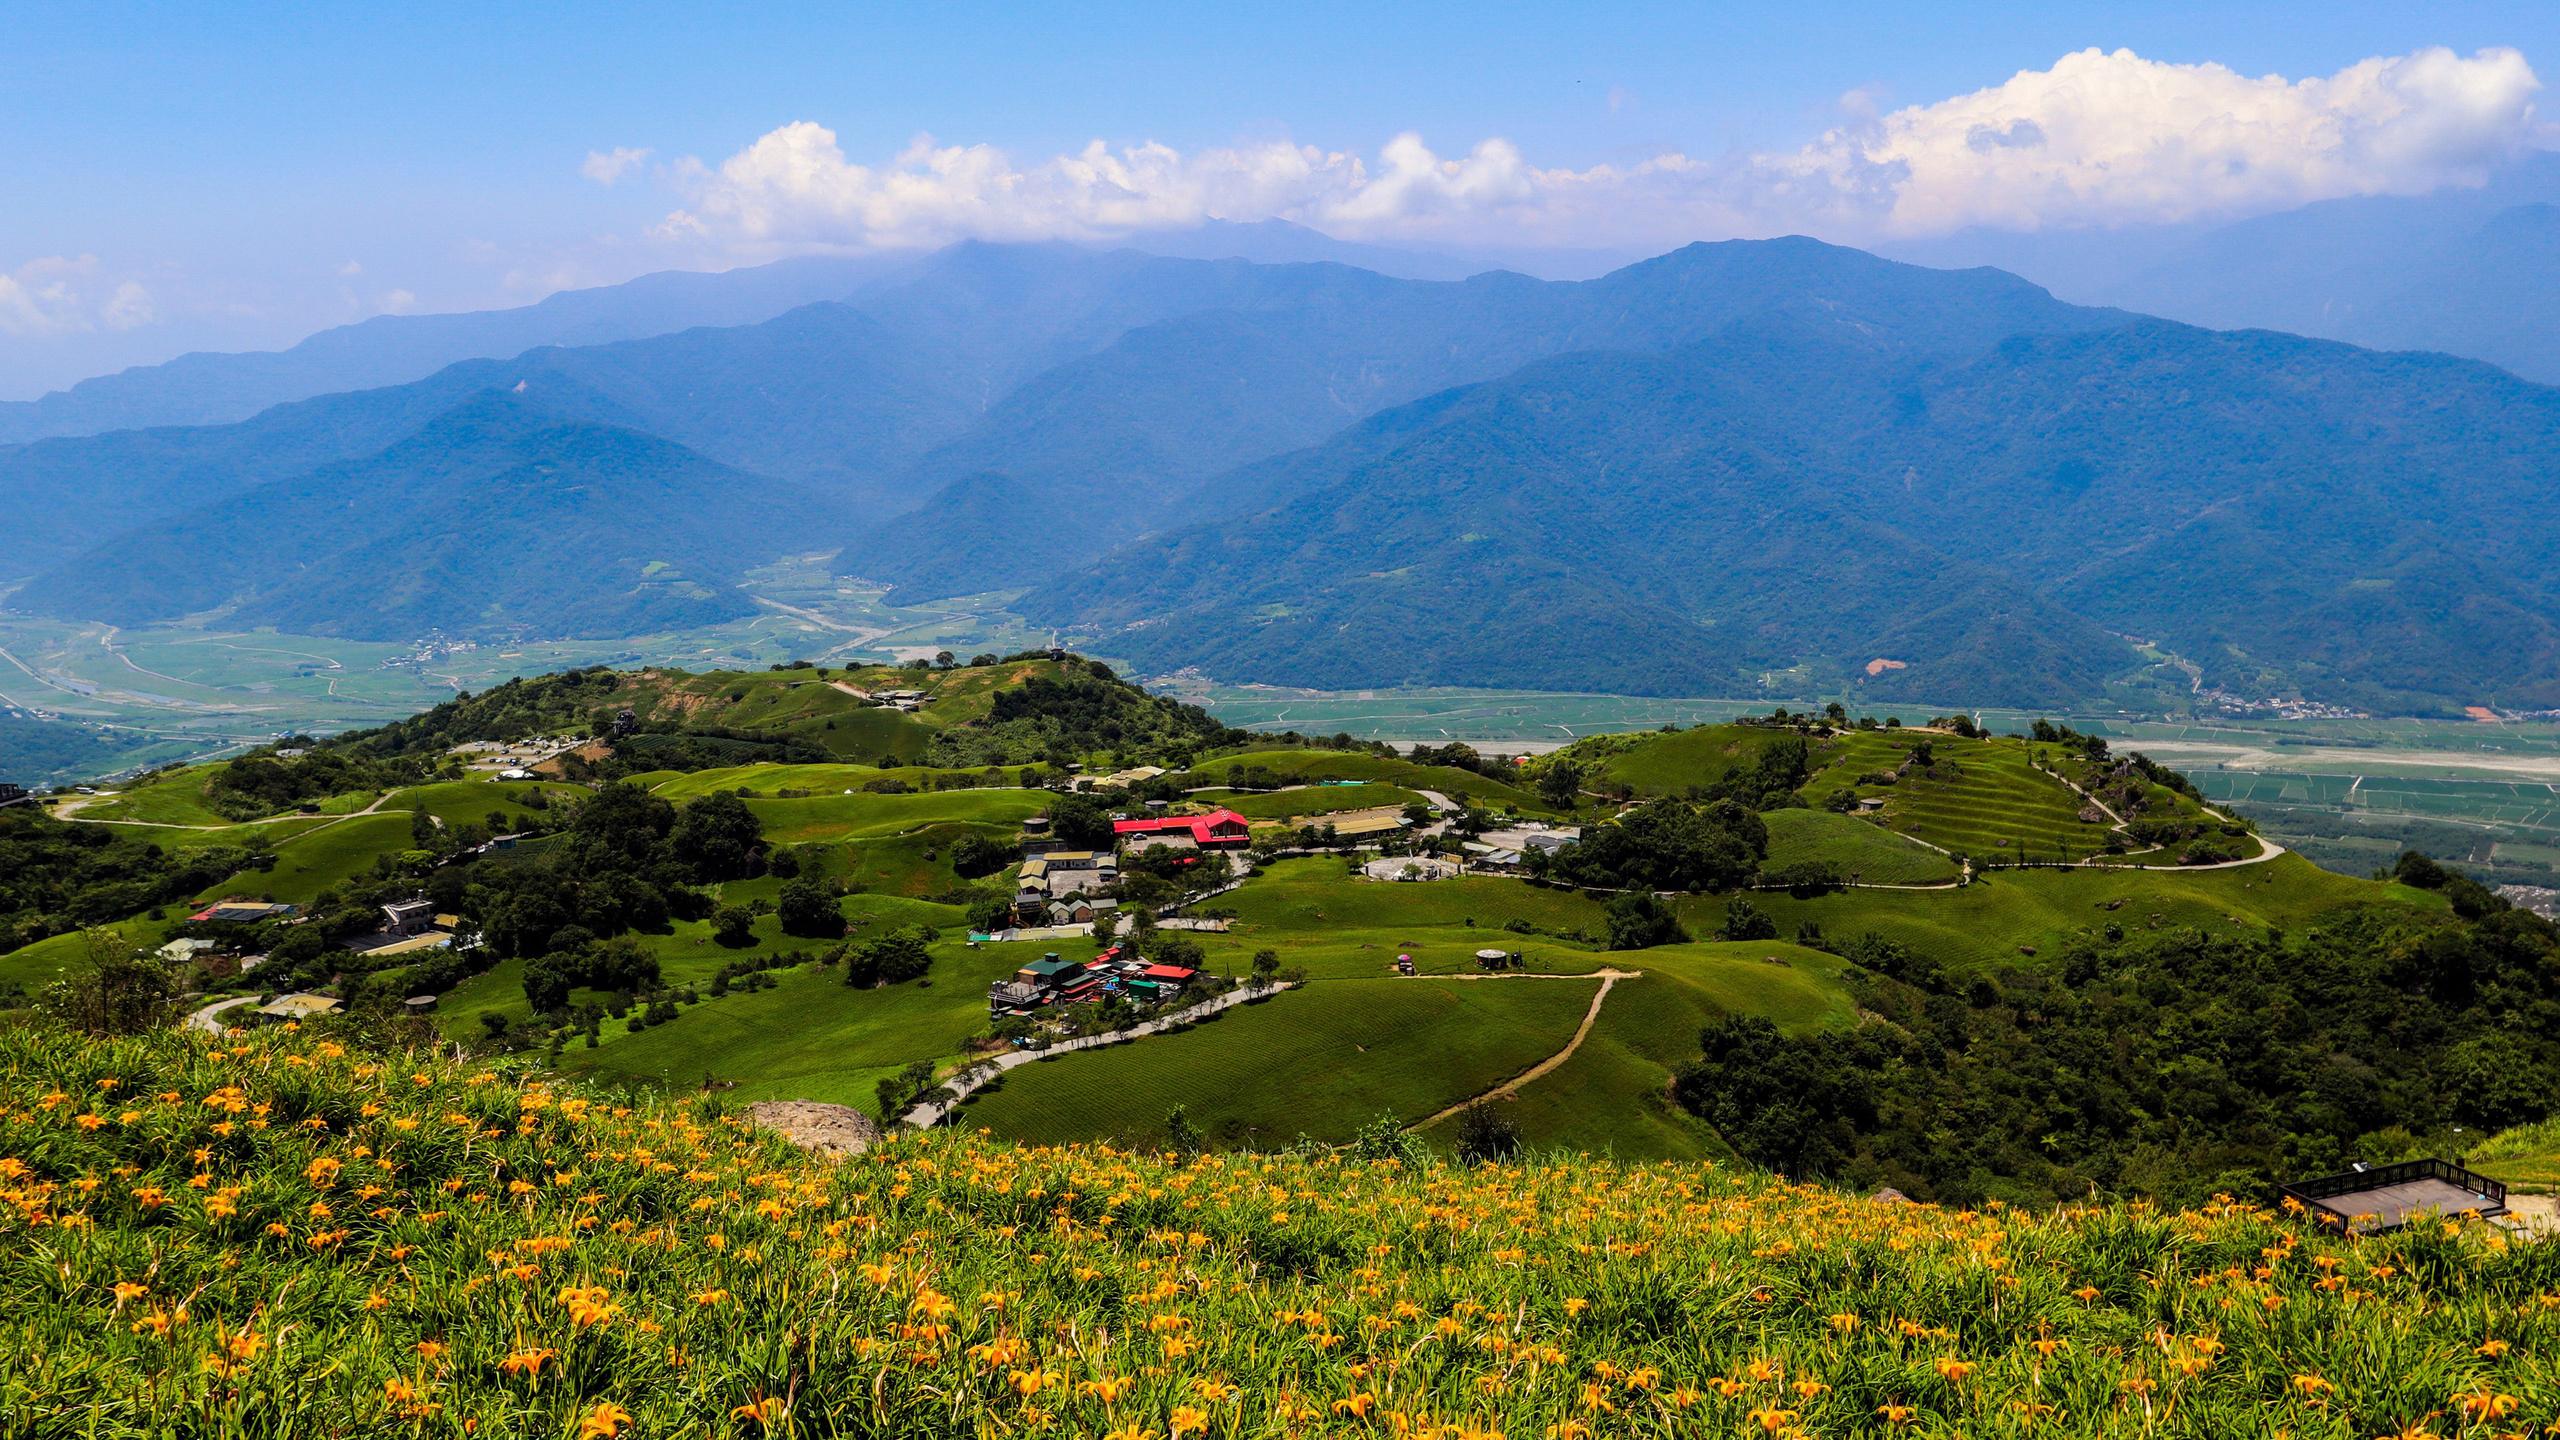 тайвань, дома, поля, луг, hualien, холмы, природа